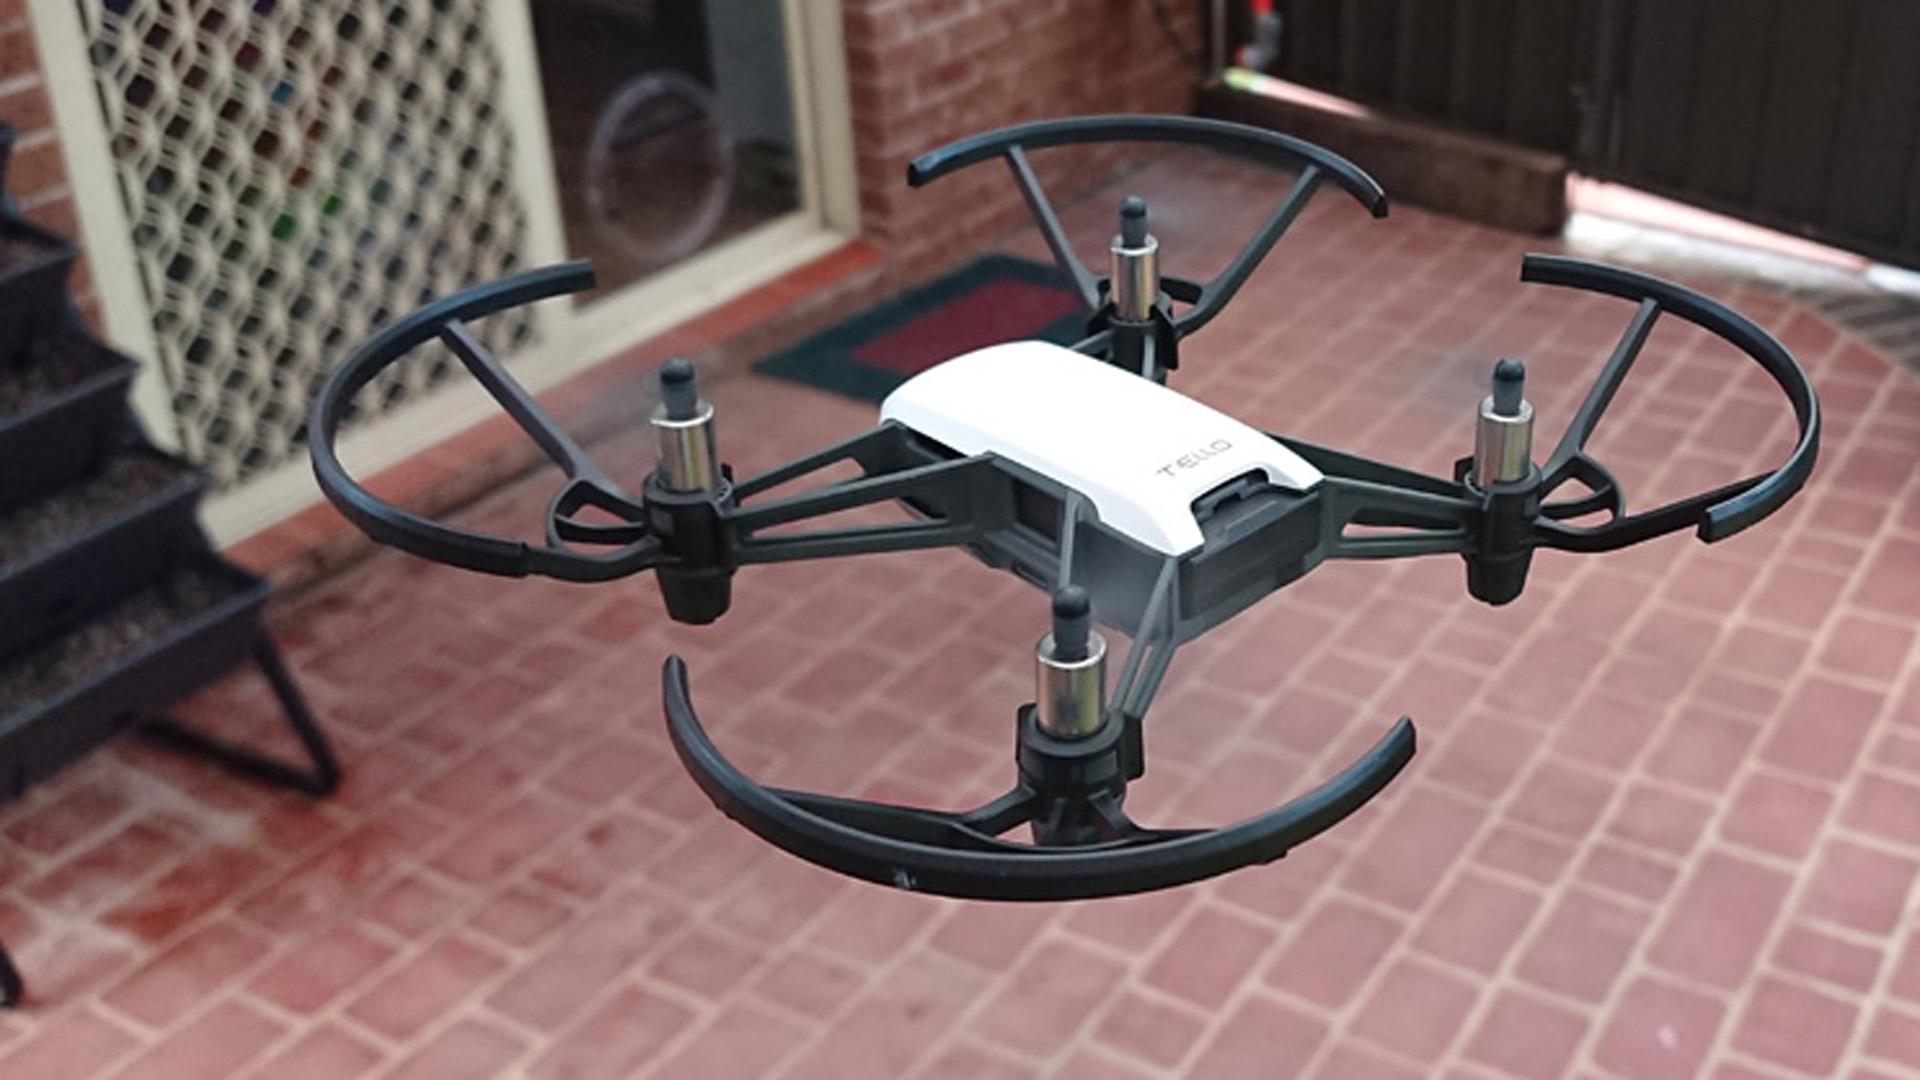 Ryze Tello Drone Review – STG